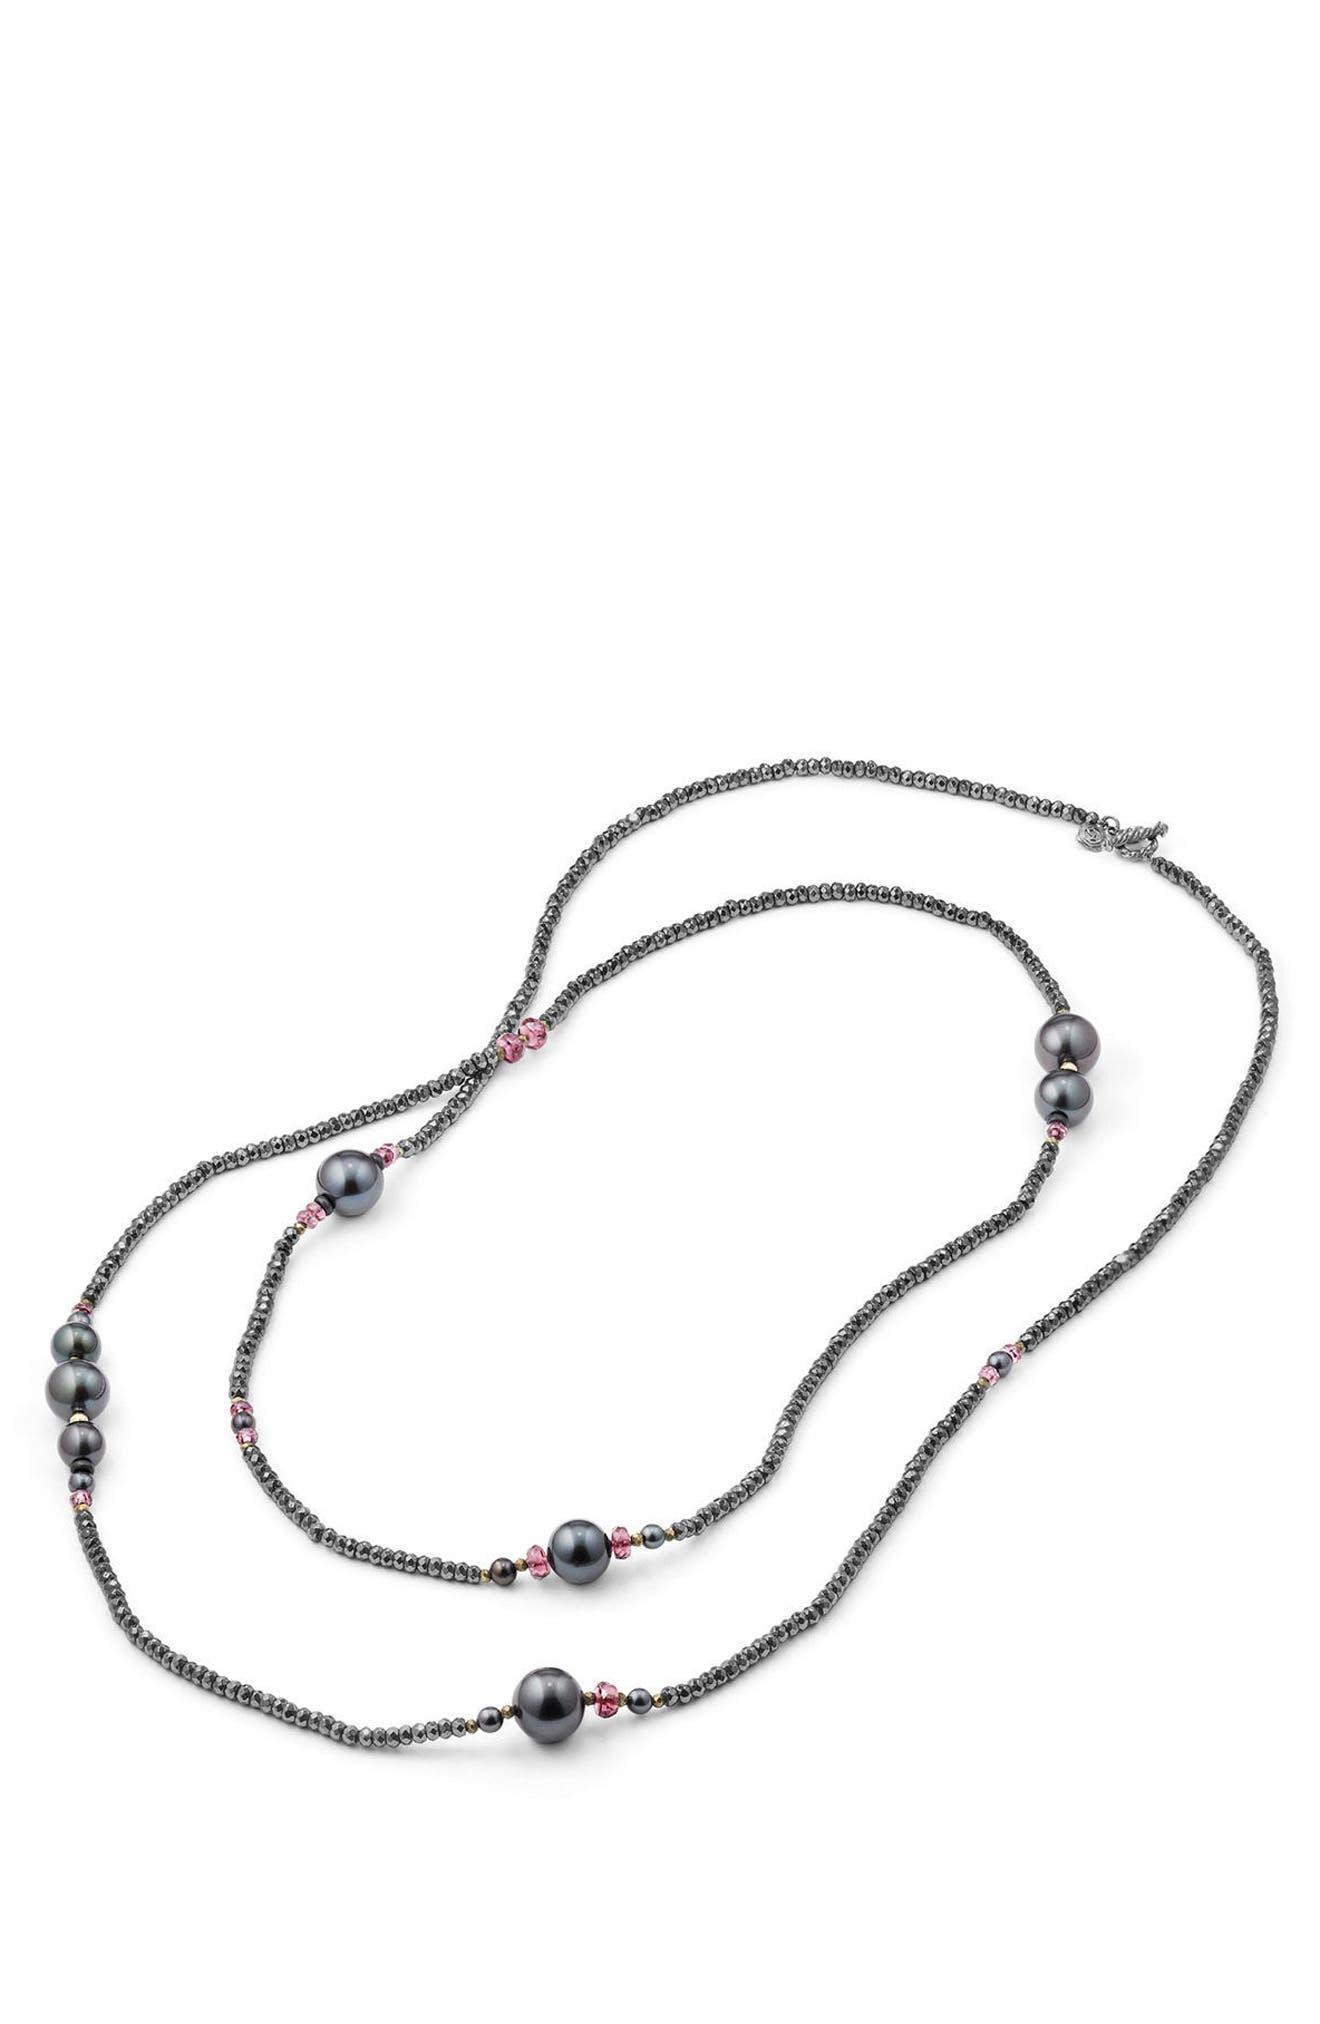 Solari - Tweejoux Pearl Necklace,                             Alternate thumbnail 2, color,                             SILVER/ GREY PEARL